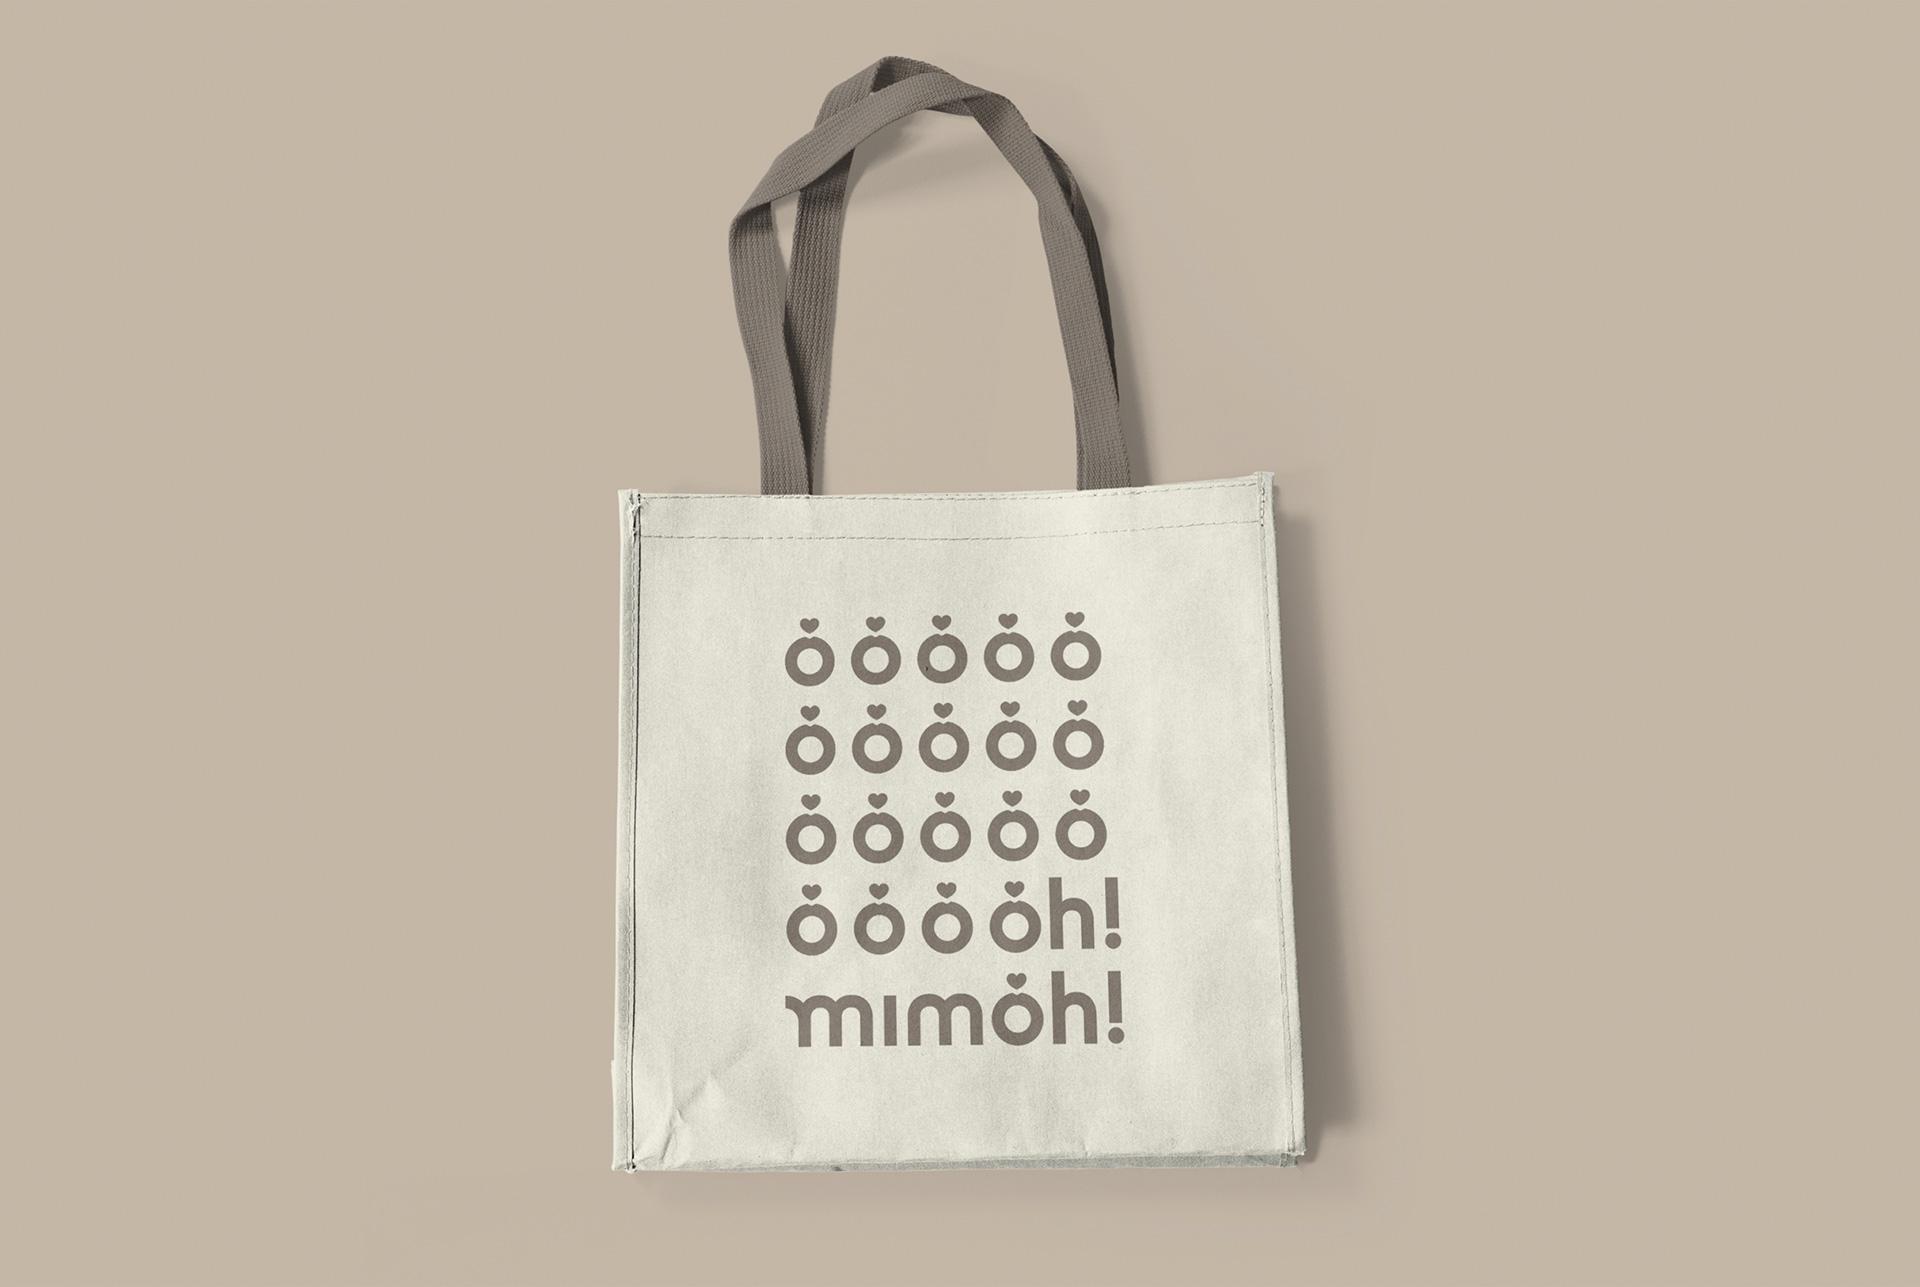 Mimoh 1